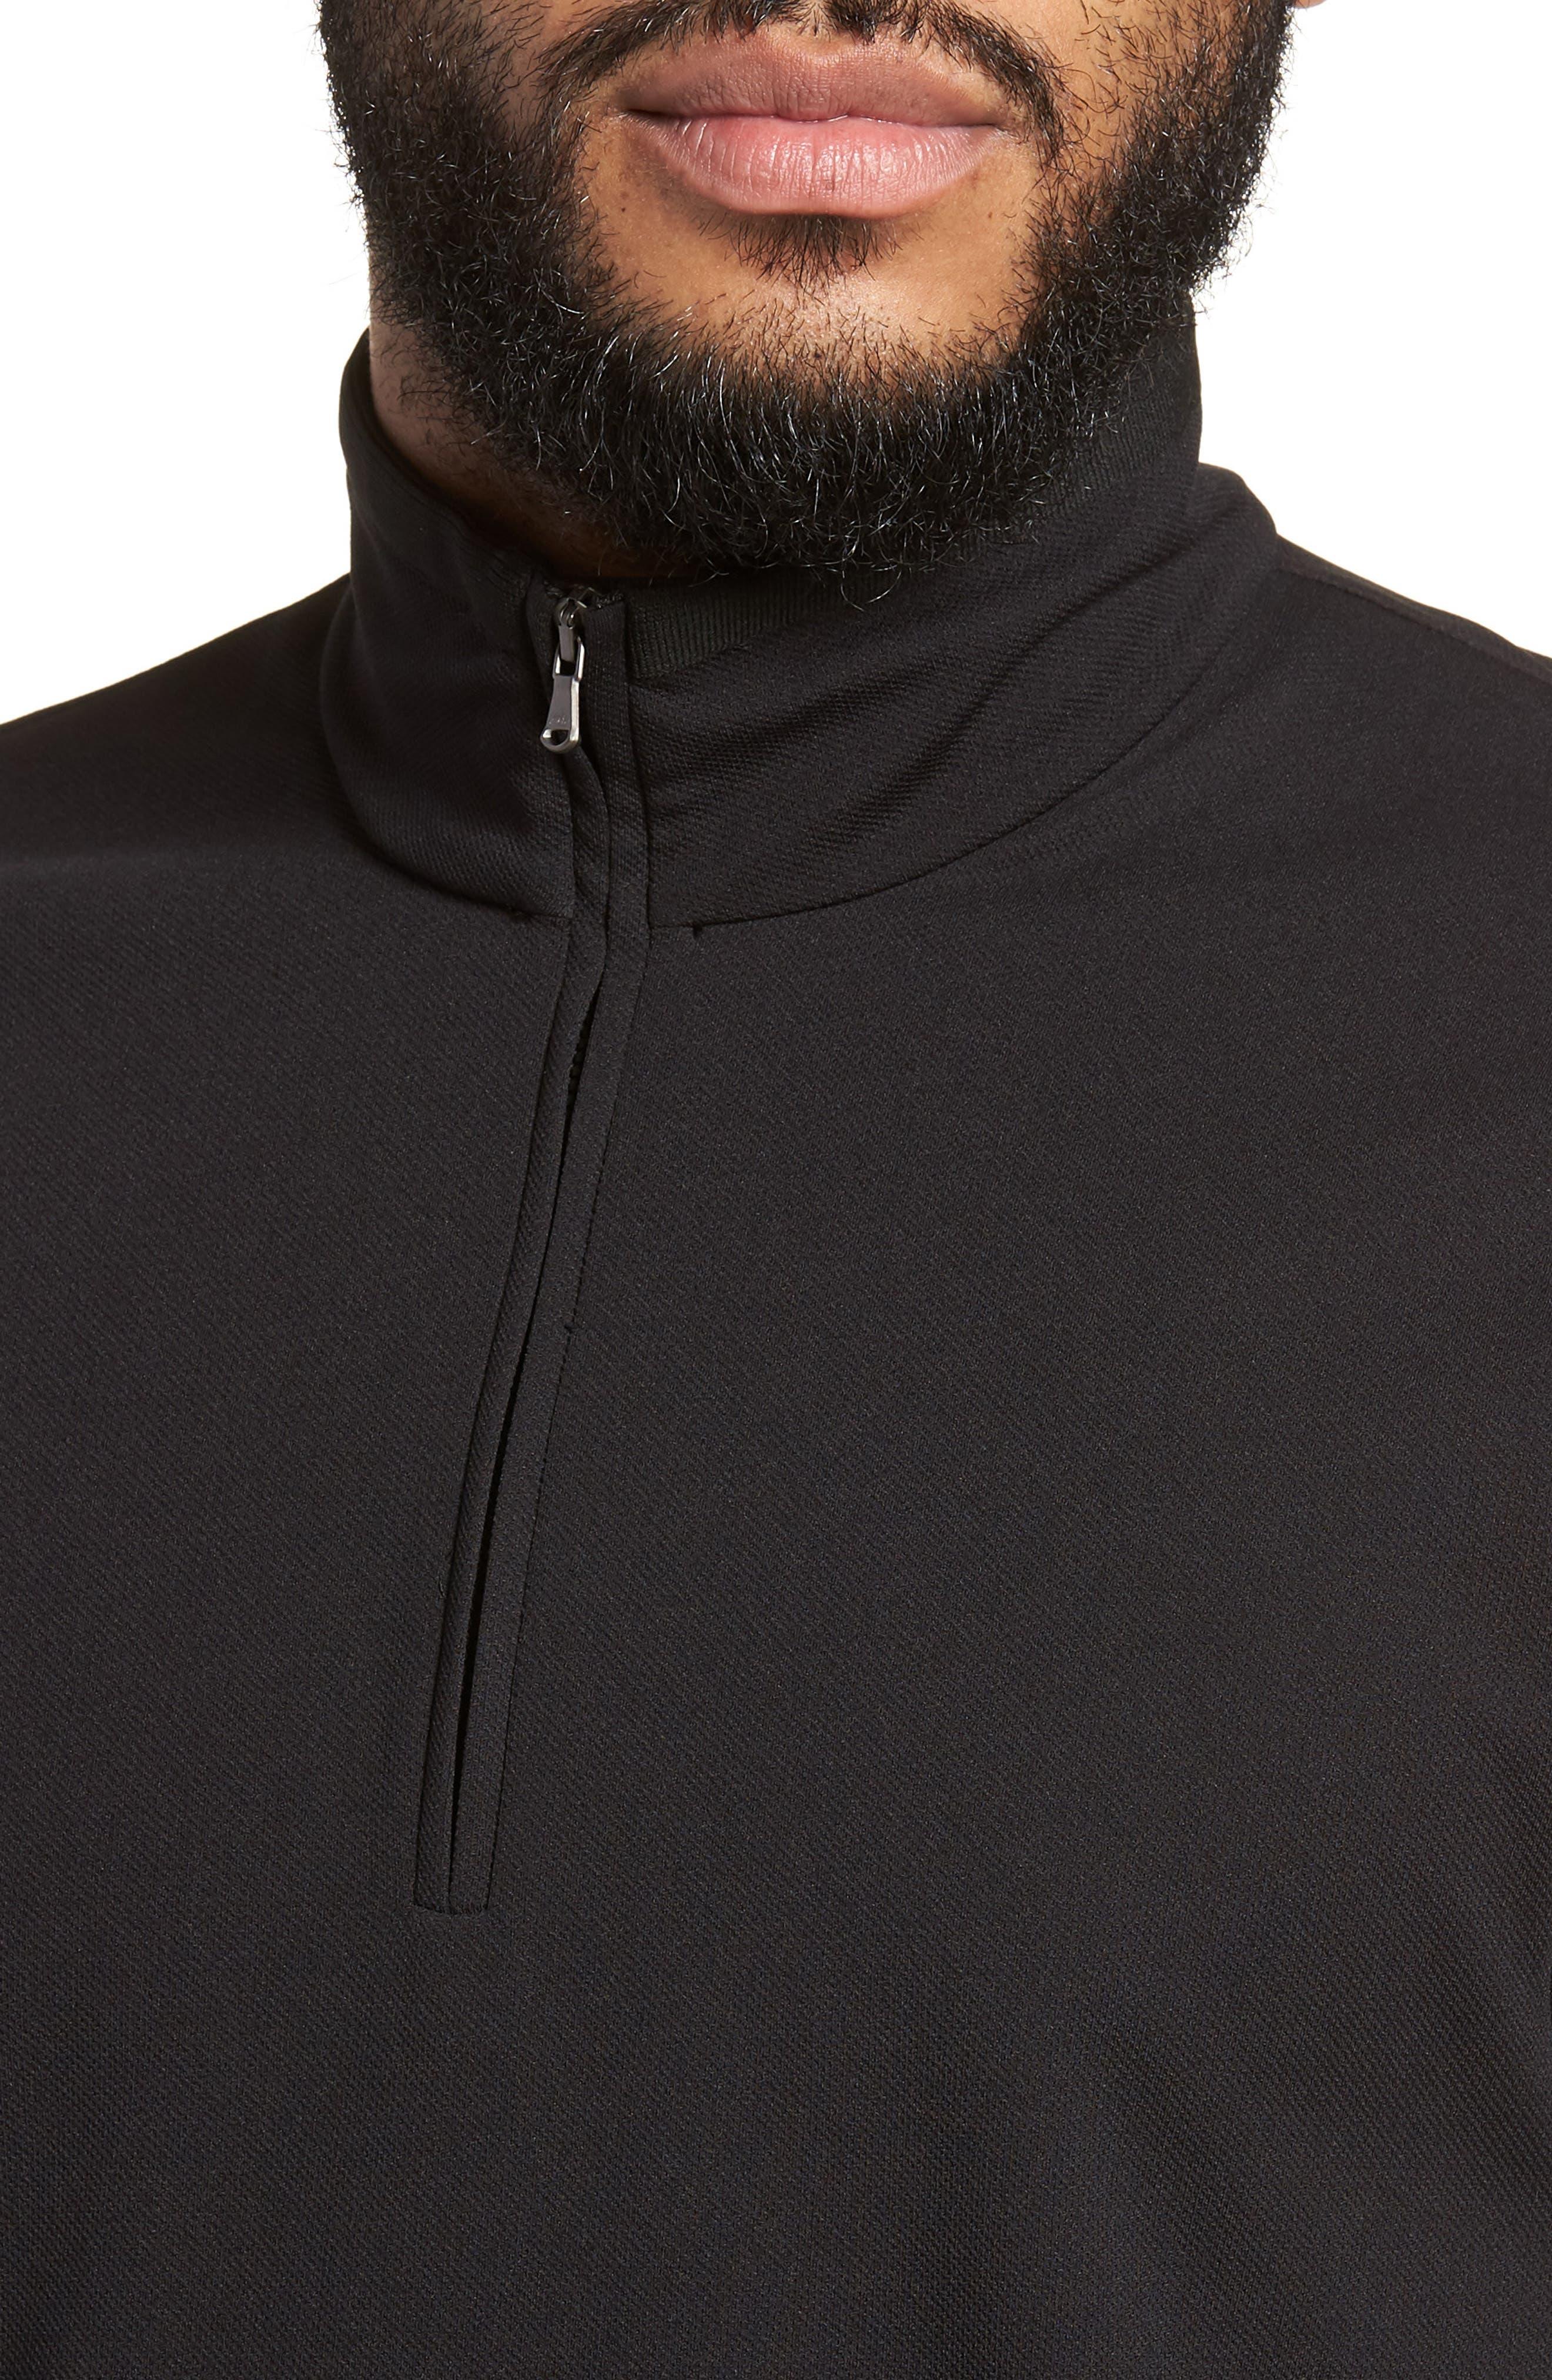 Performance Quarter Zip Pullover,                             Alternate thumbnail 4, color,                             Black/ Black